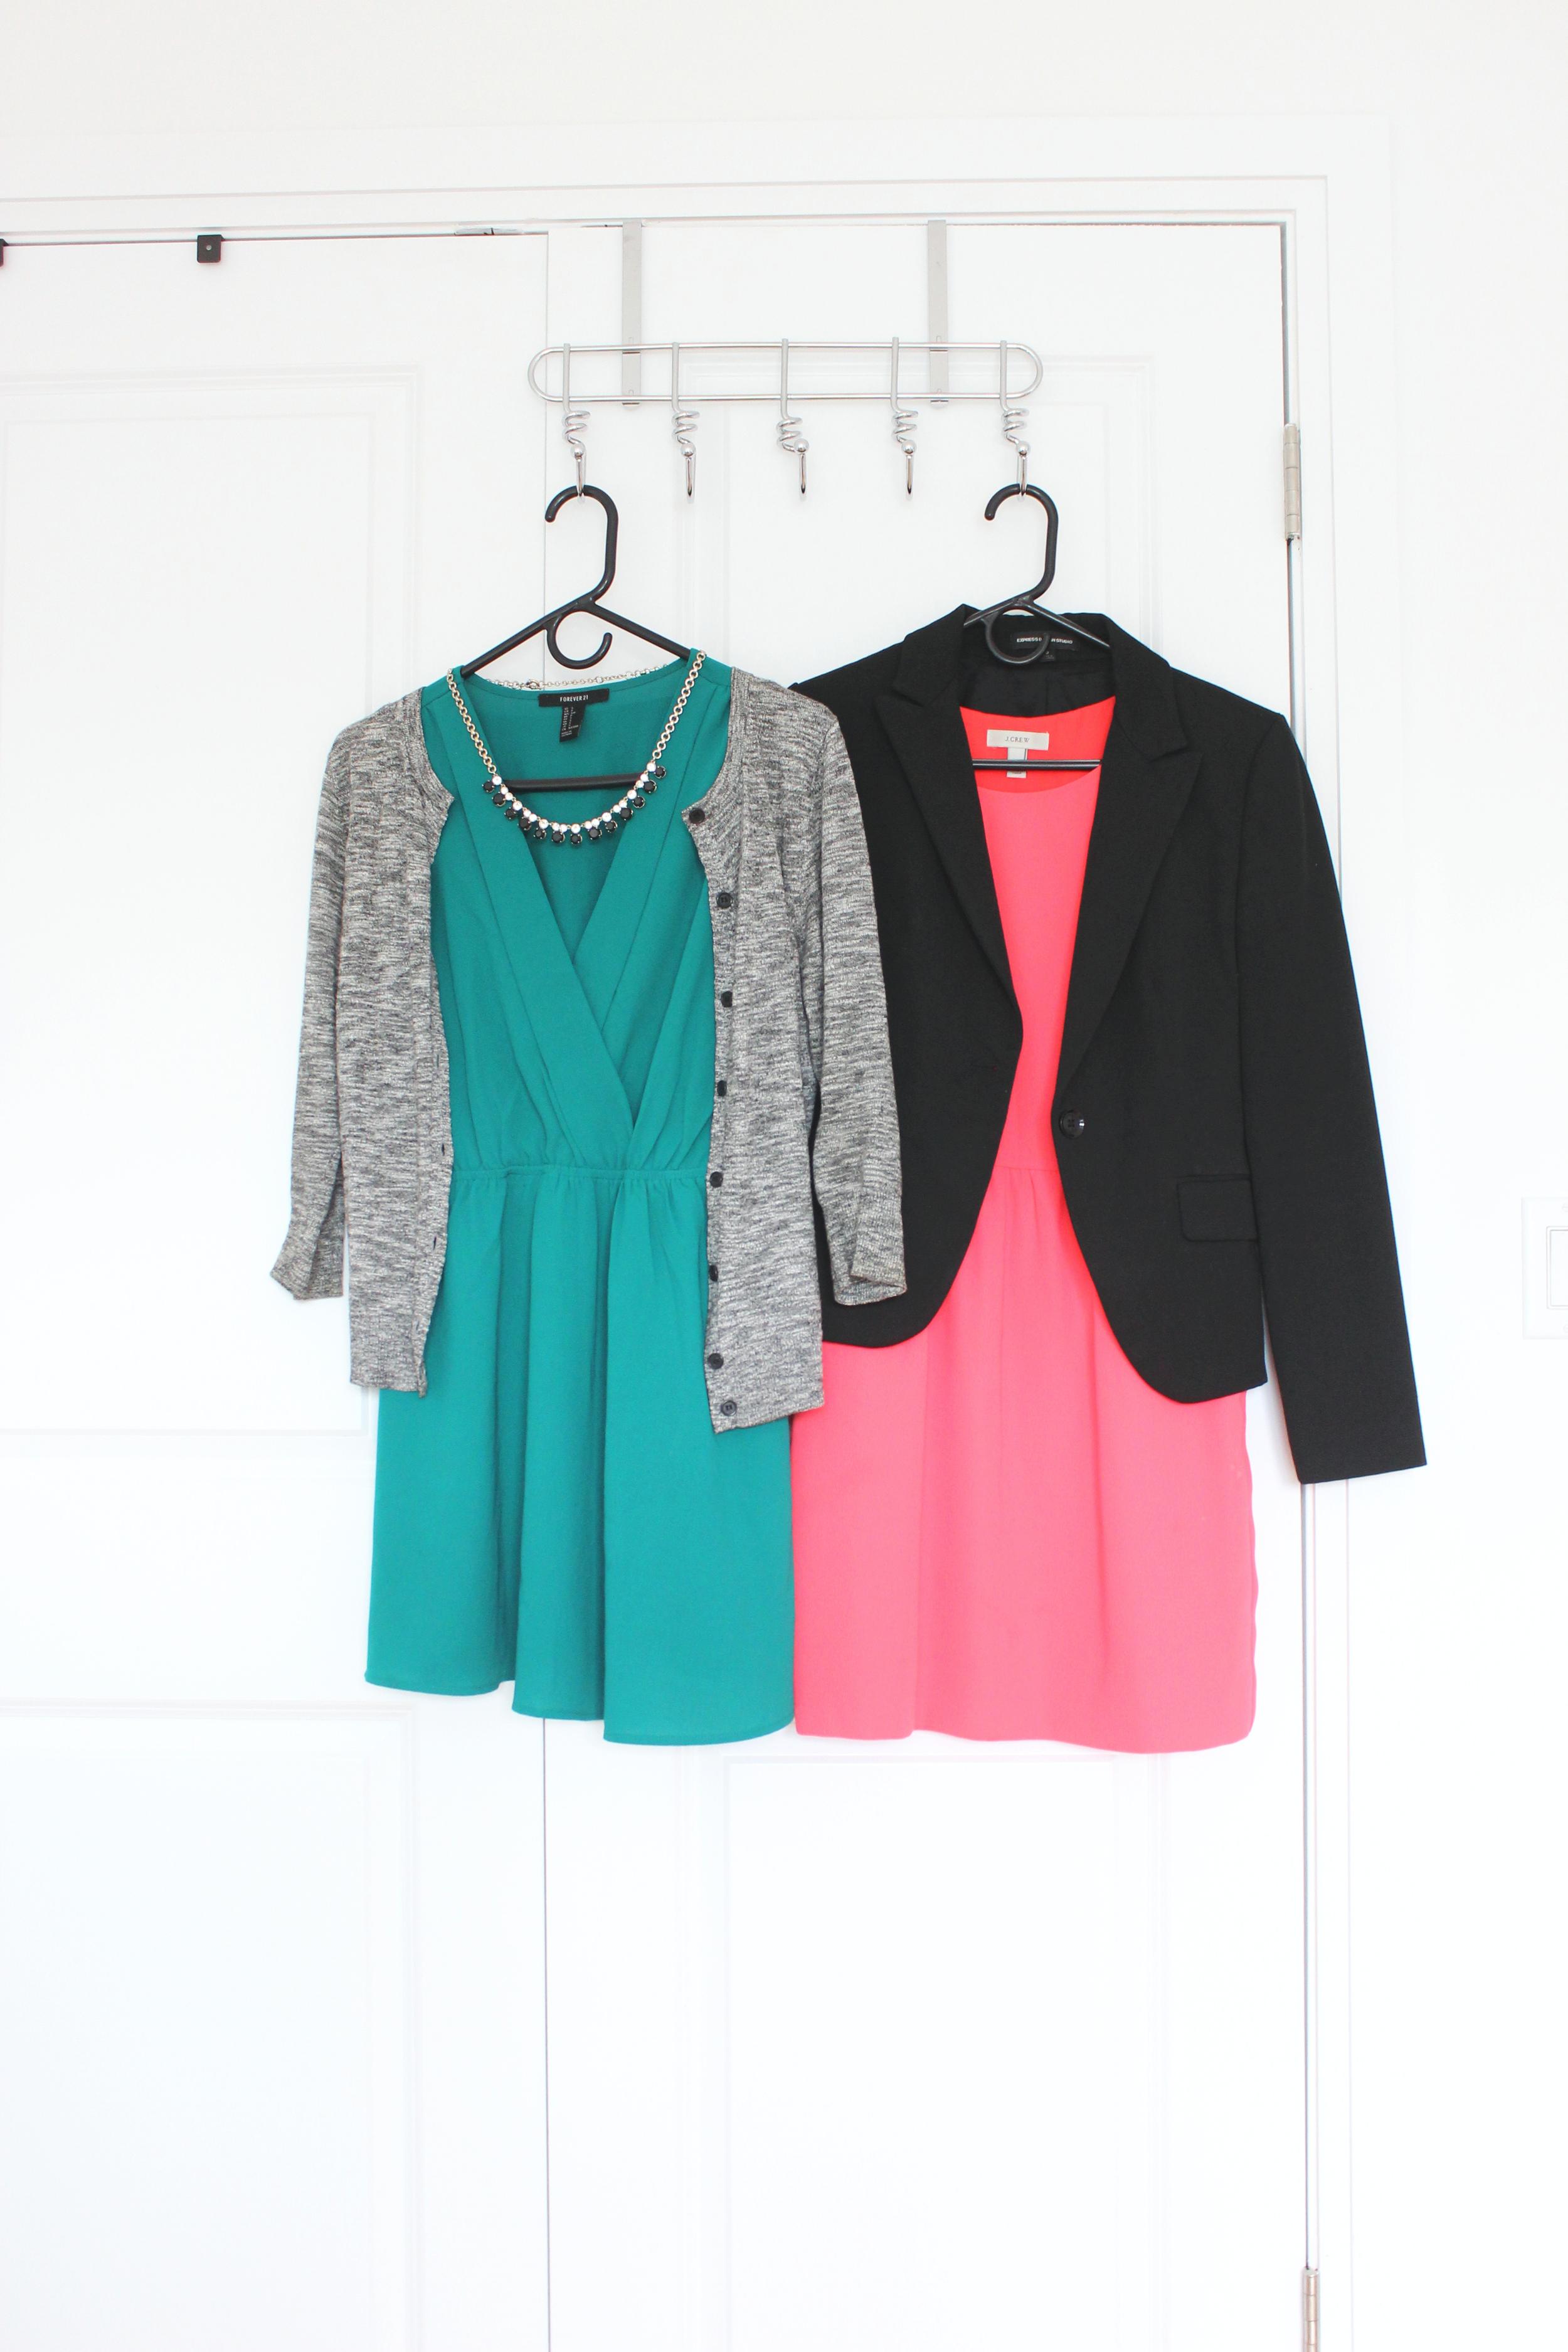 Left to right: 1. Grey cardigan ( LOFT , old) 2. Green dress ( Forever21 , old) 3. Black blazer ( Express , old) 4. Pink dress ( Jcrew , old)